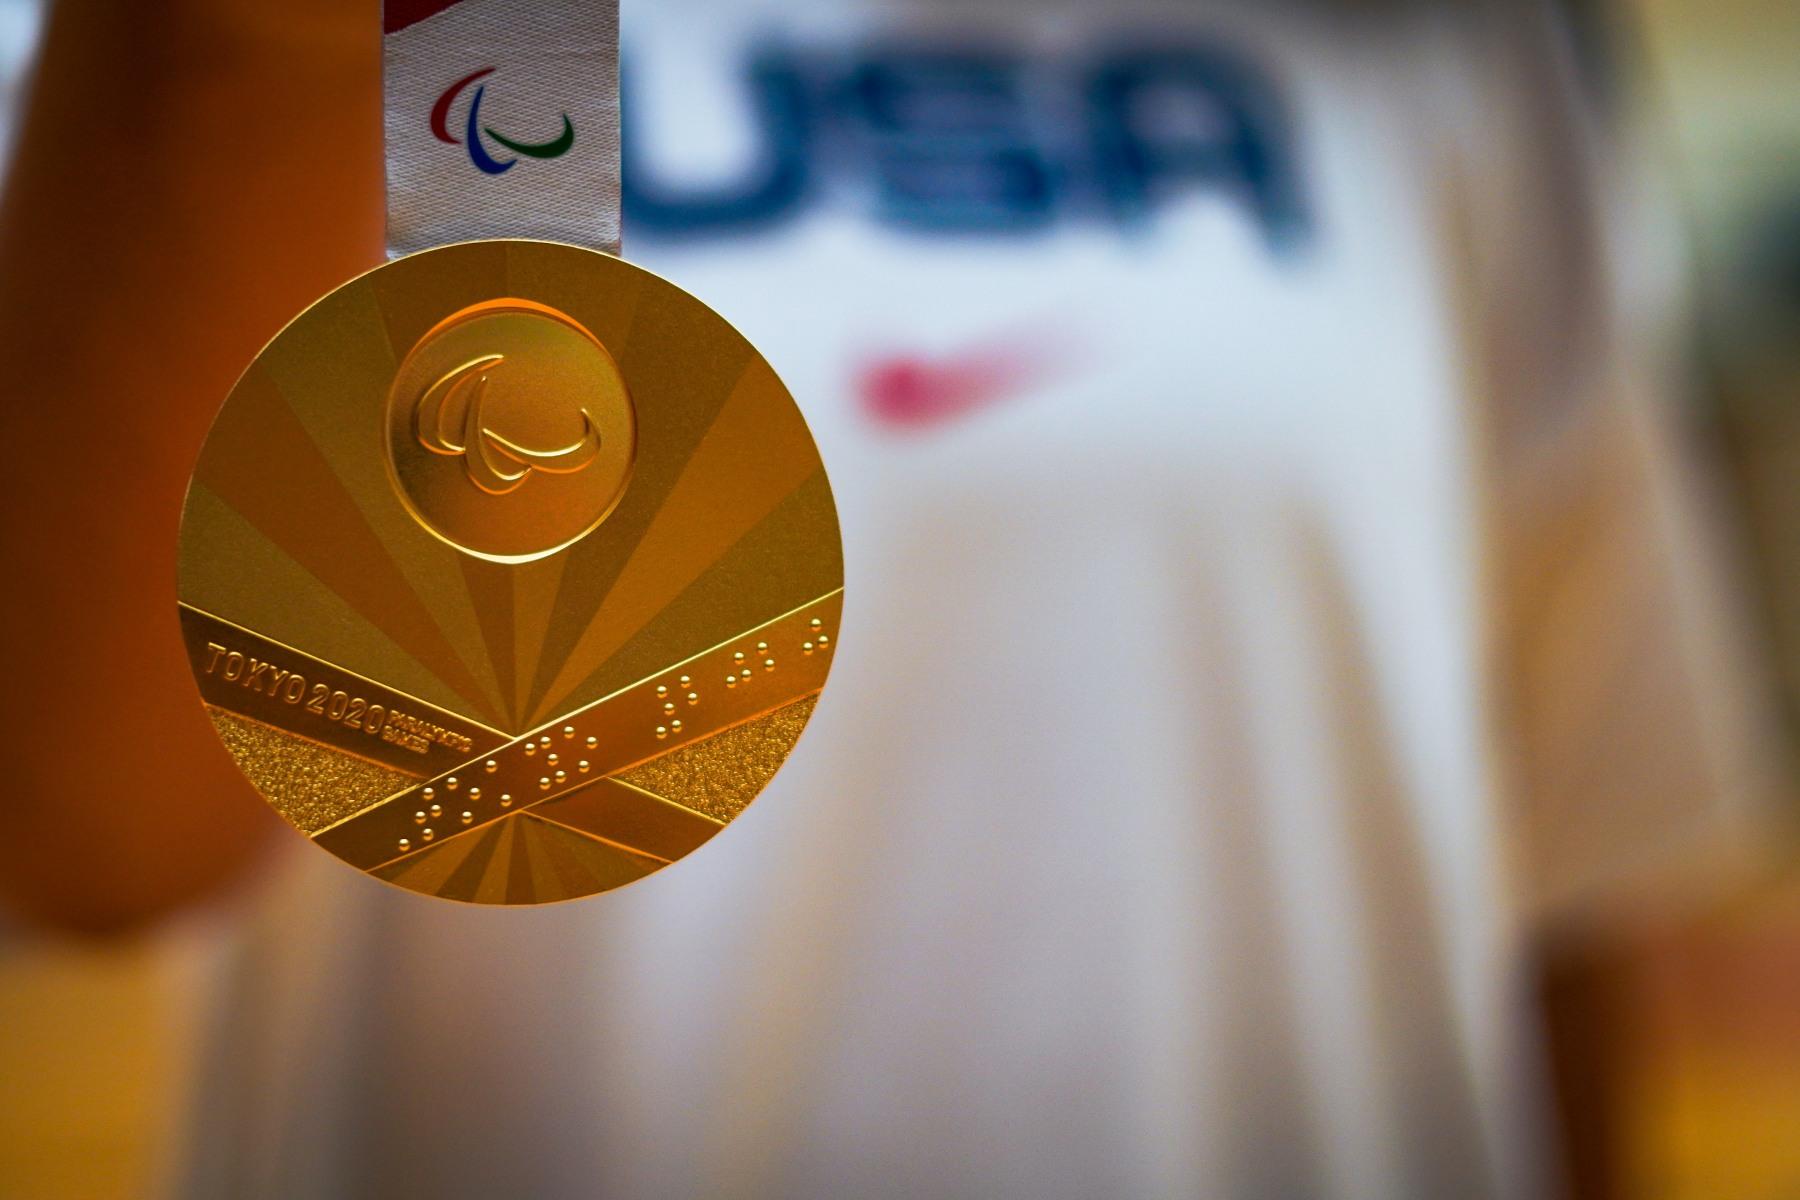 Flashing the Gold